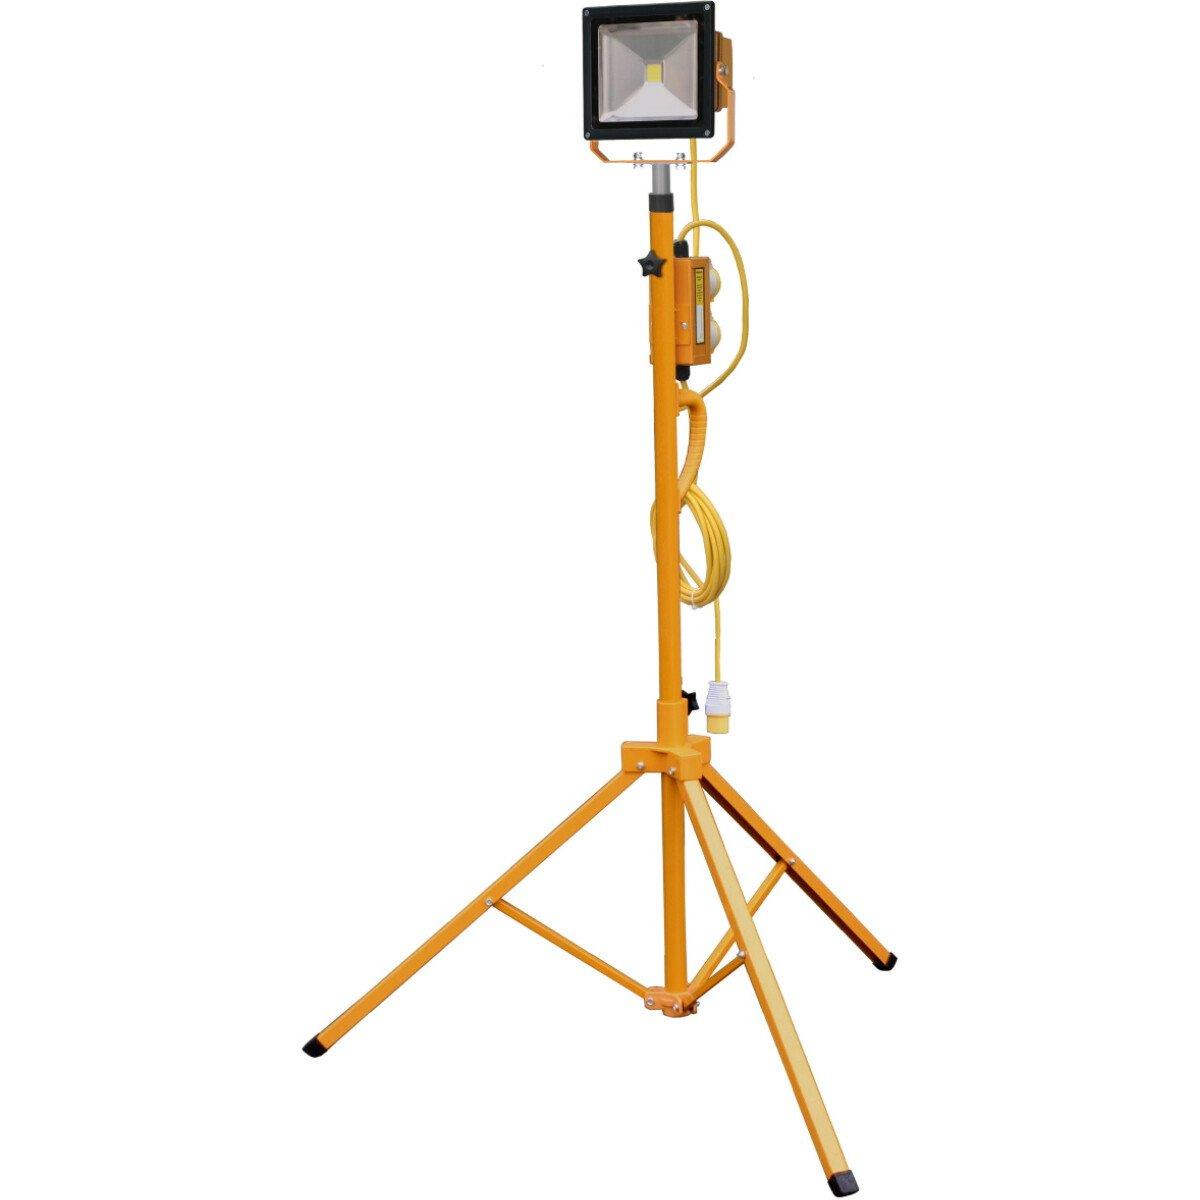 Spectre SP-17184 110V HD 30W COB LED Floodlight Work Light